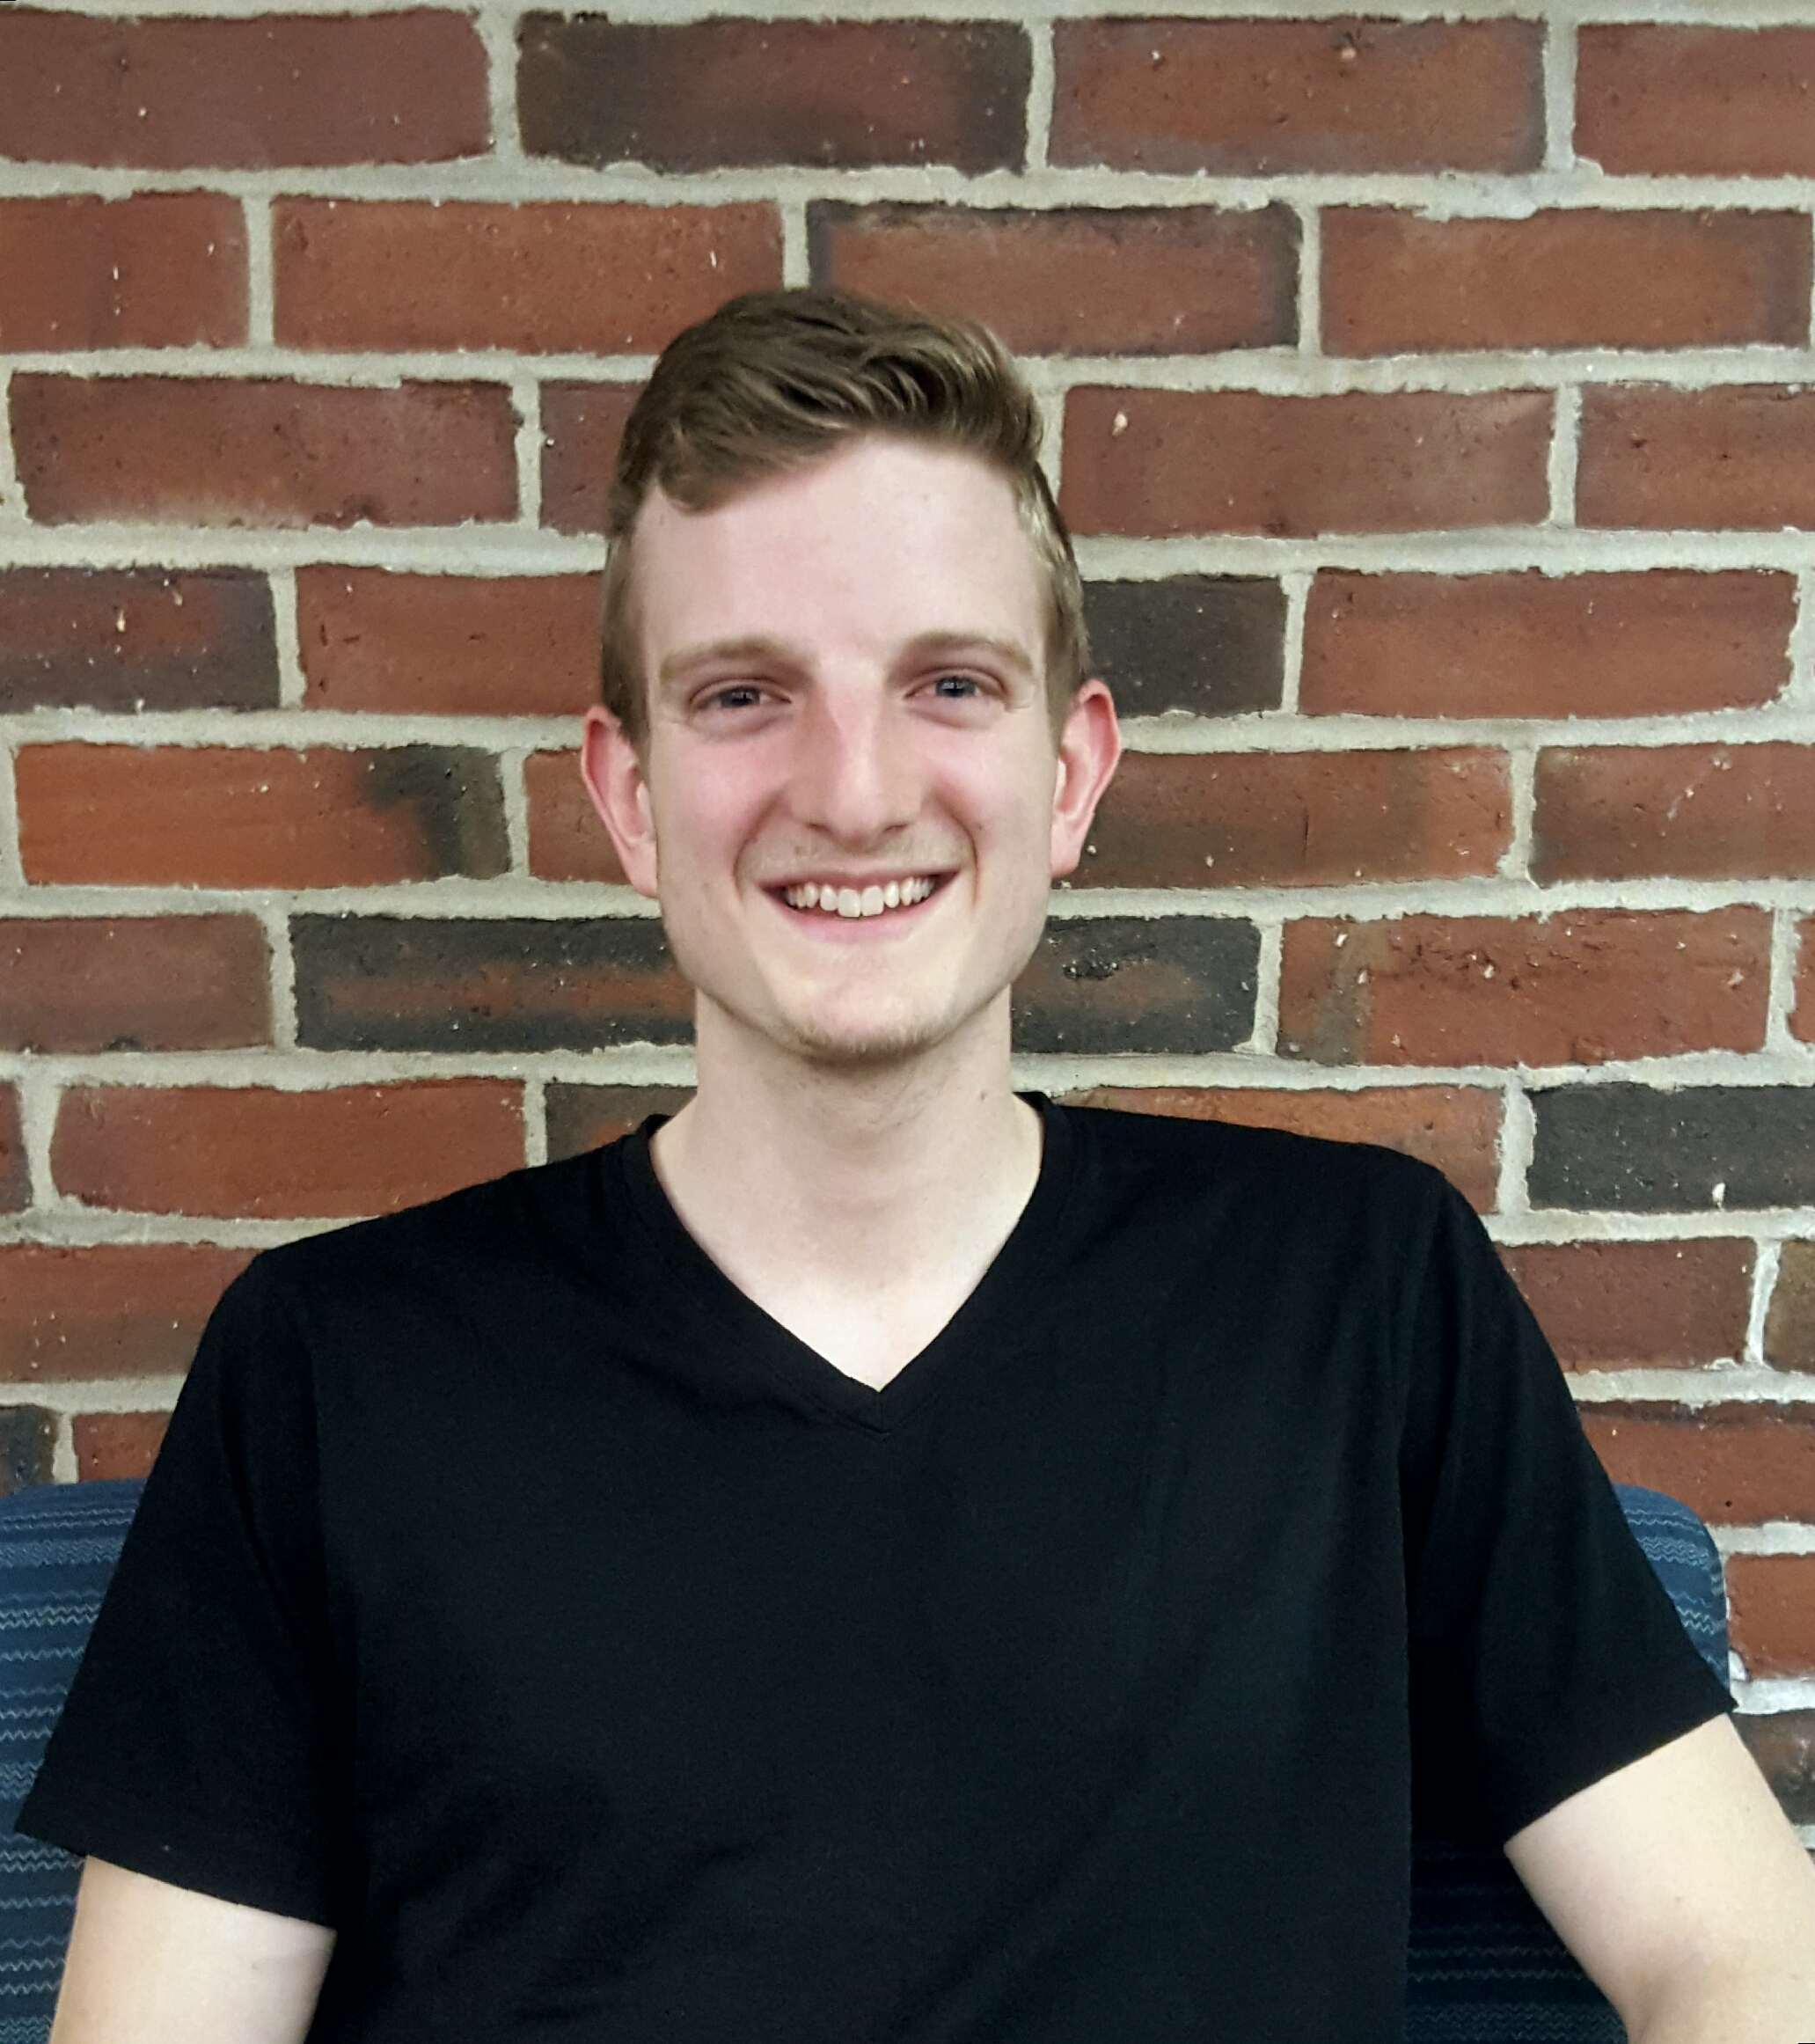 Photo of a Yaymaker Host named Sean McCrobie #TeamDaykin